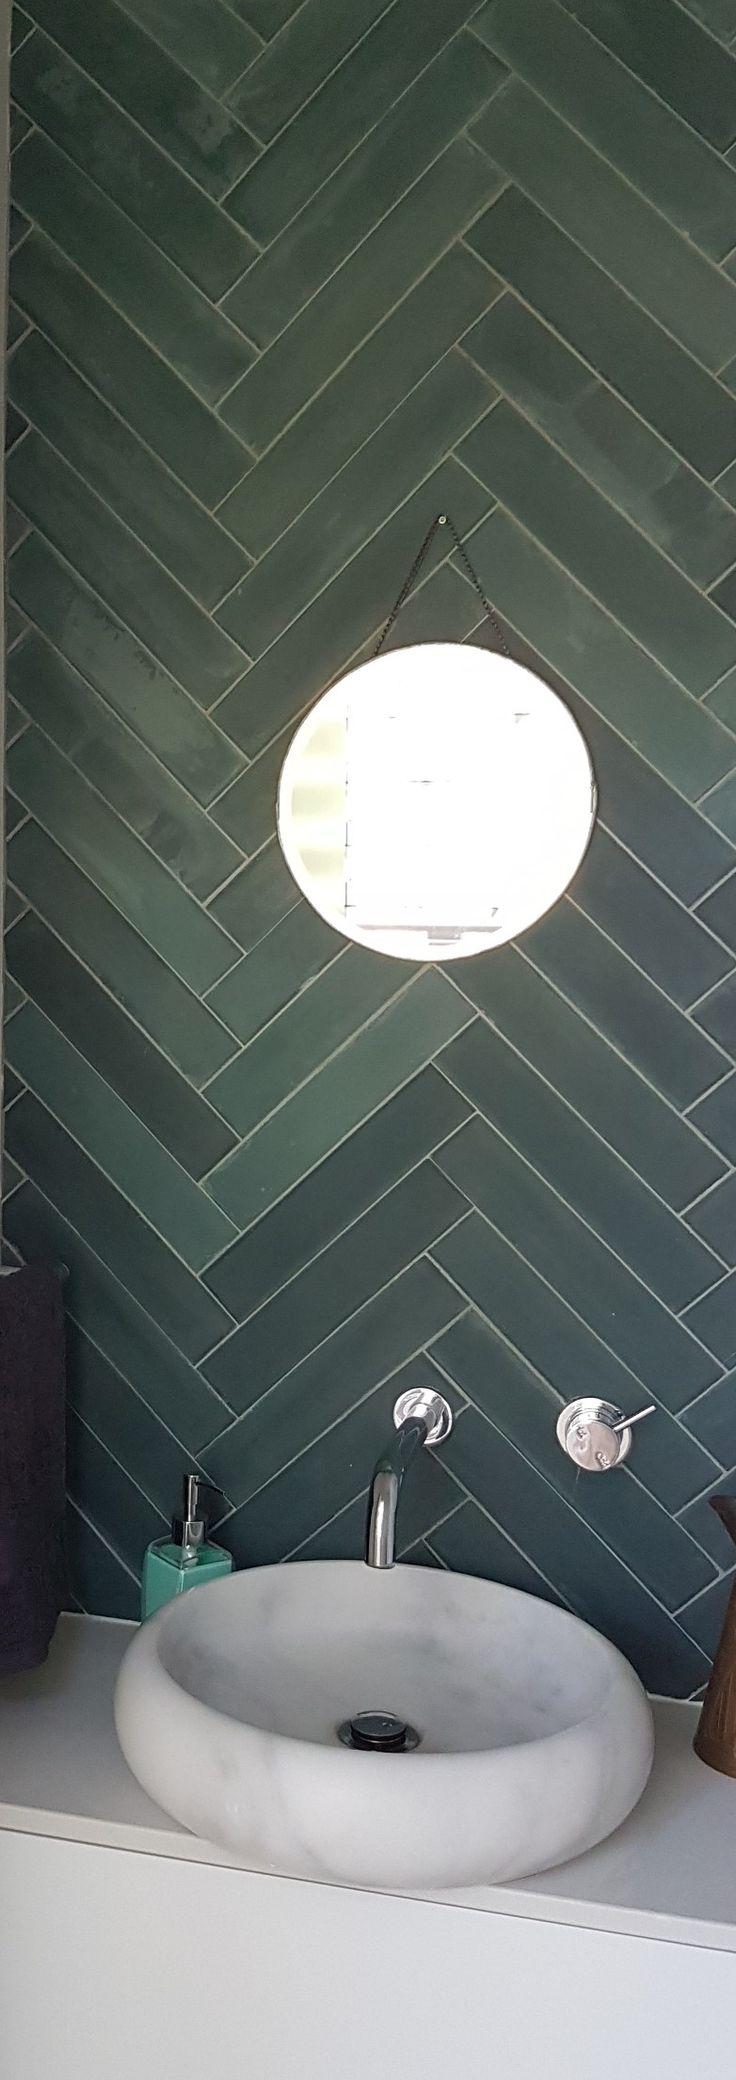 Cyprus baguette laid herringbone ...perfect powder room wall in our clients beach house #cementtiles #encaustictiles #popham #pophamtilesaustralia #cementtilesbyronbay #herringbone #encaustictilesbrisbane